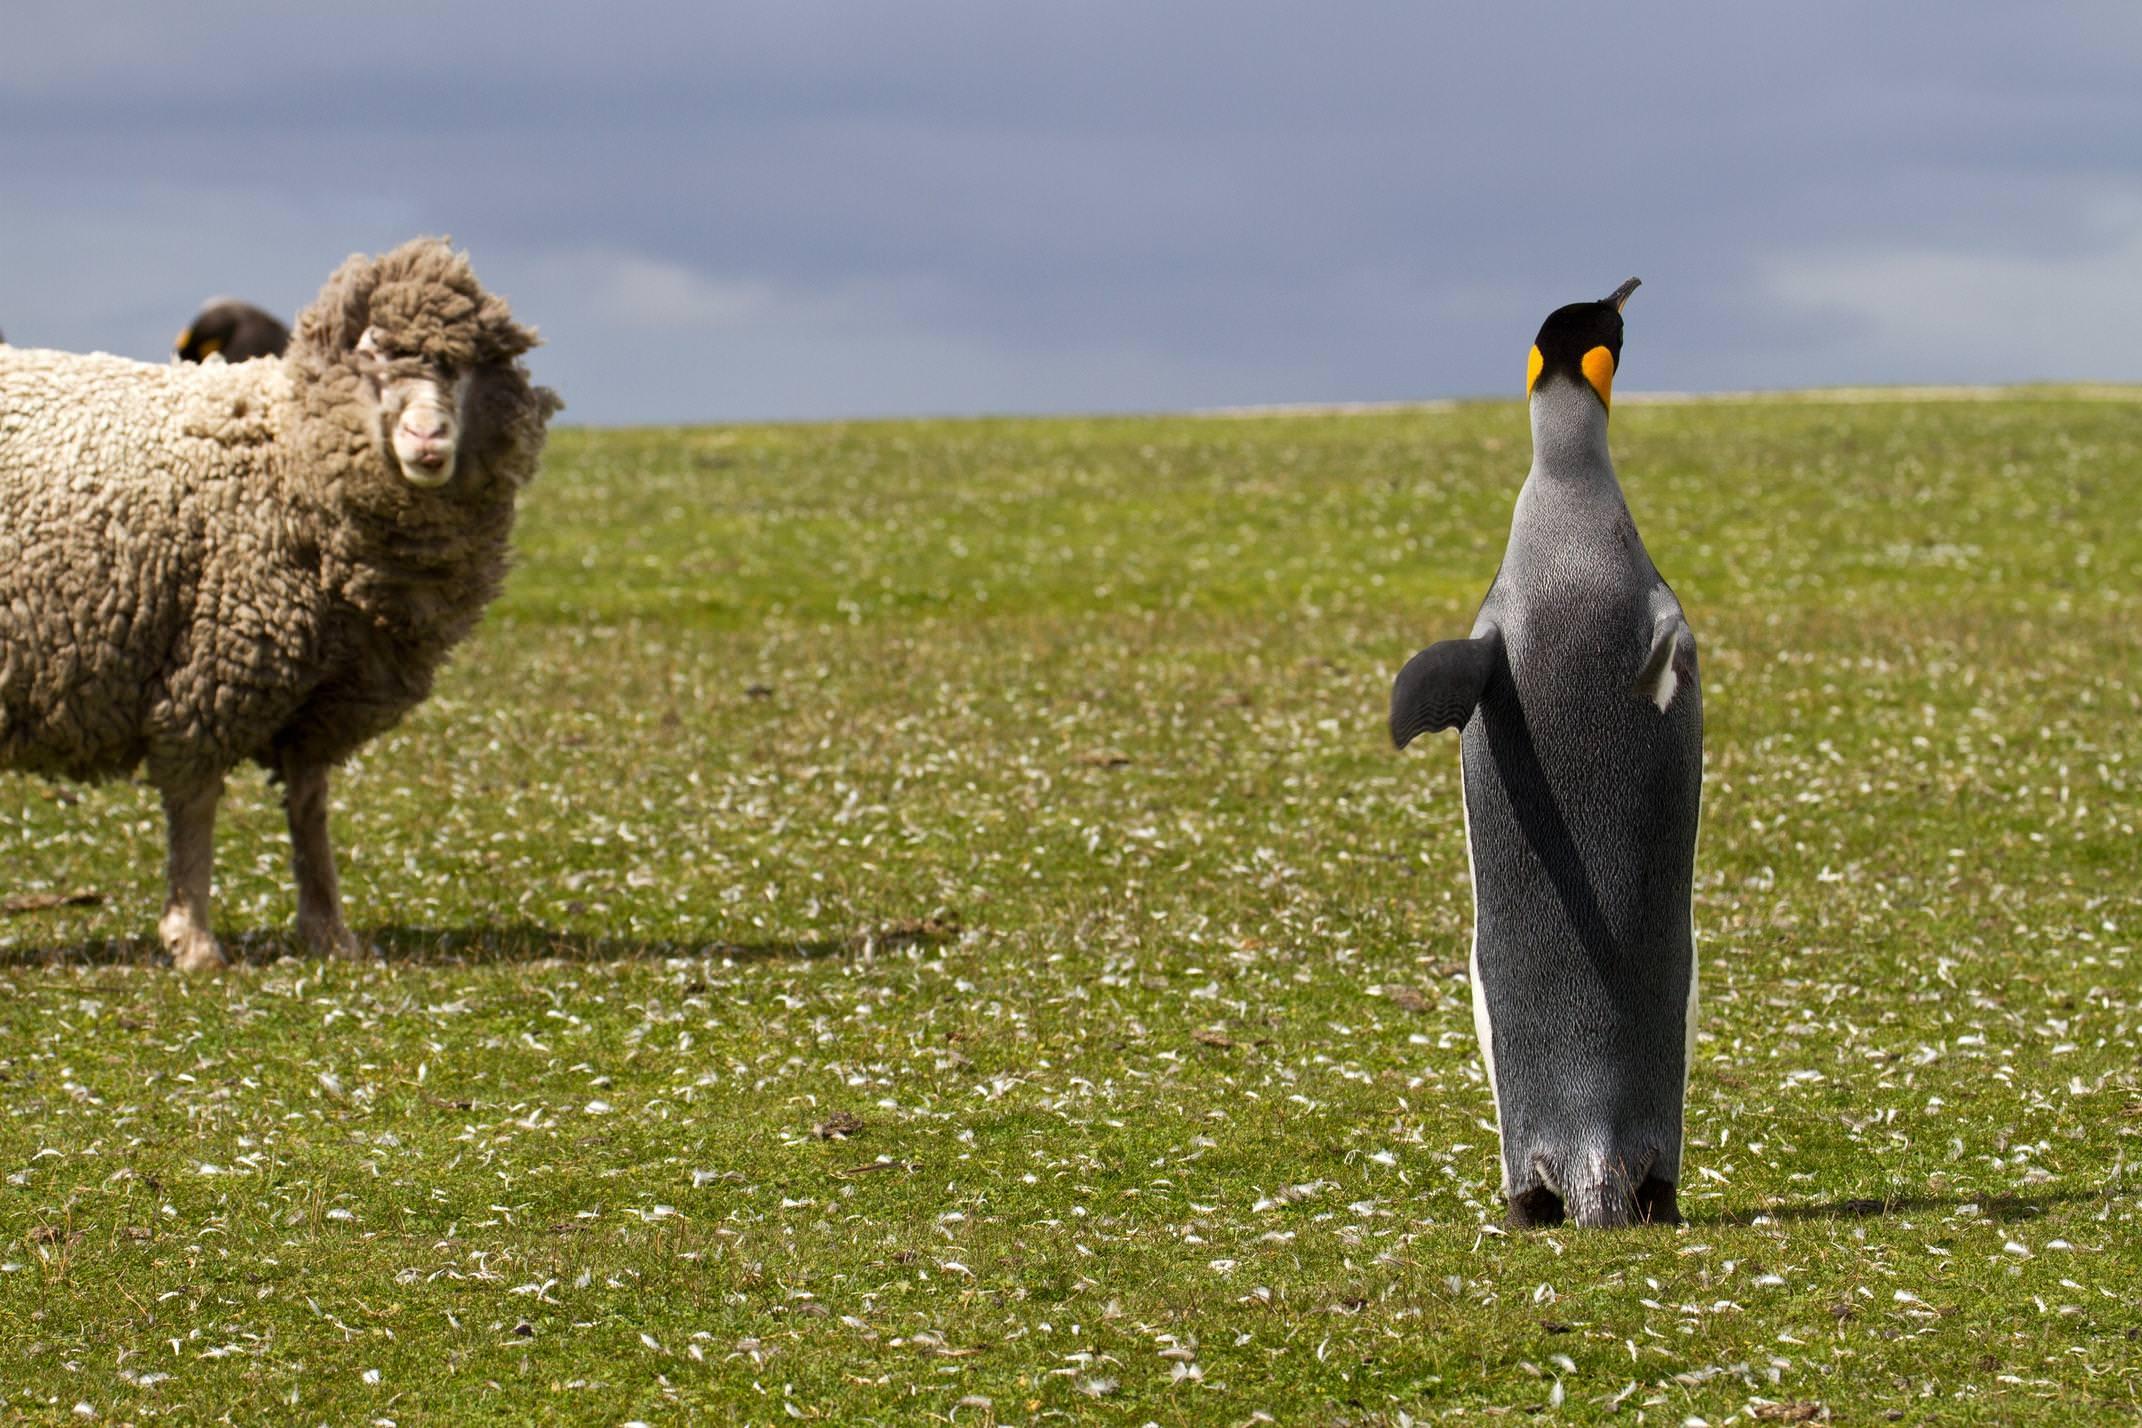 Antarctica southern oceans falklands islands king penguin and sheep c manfred thuerig